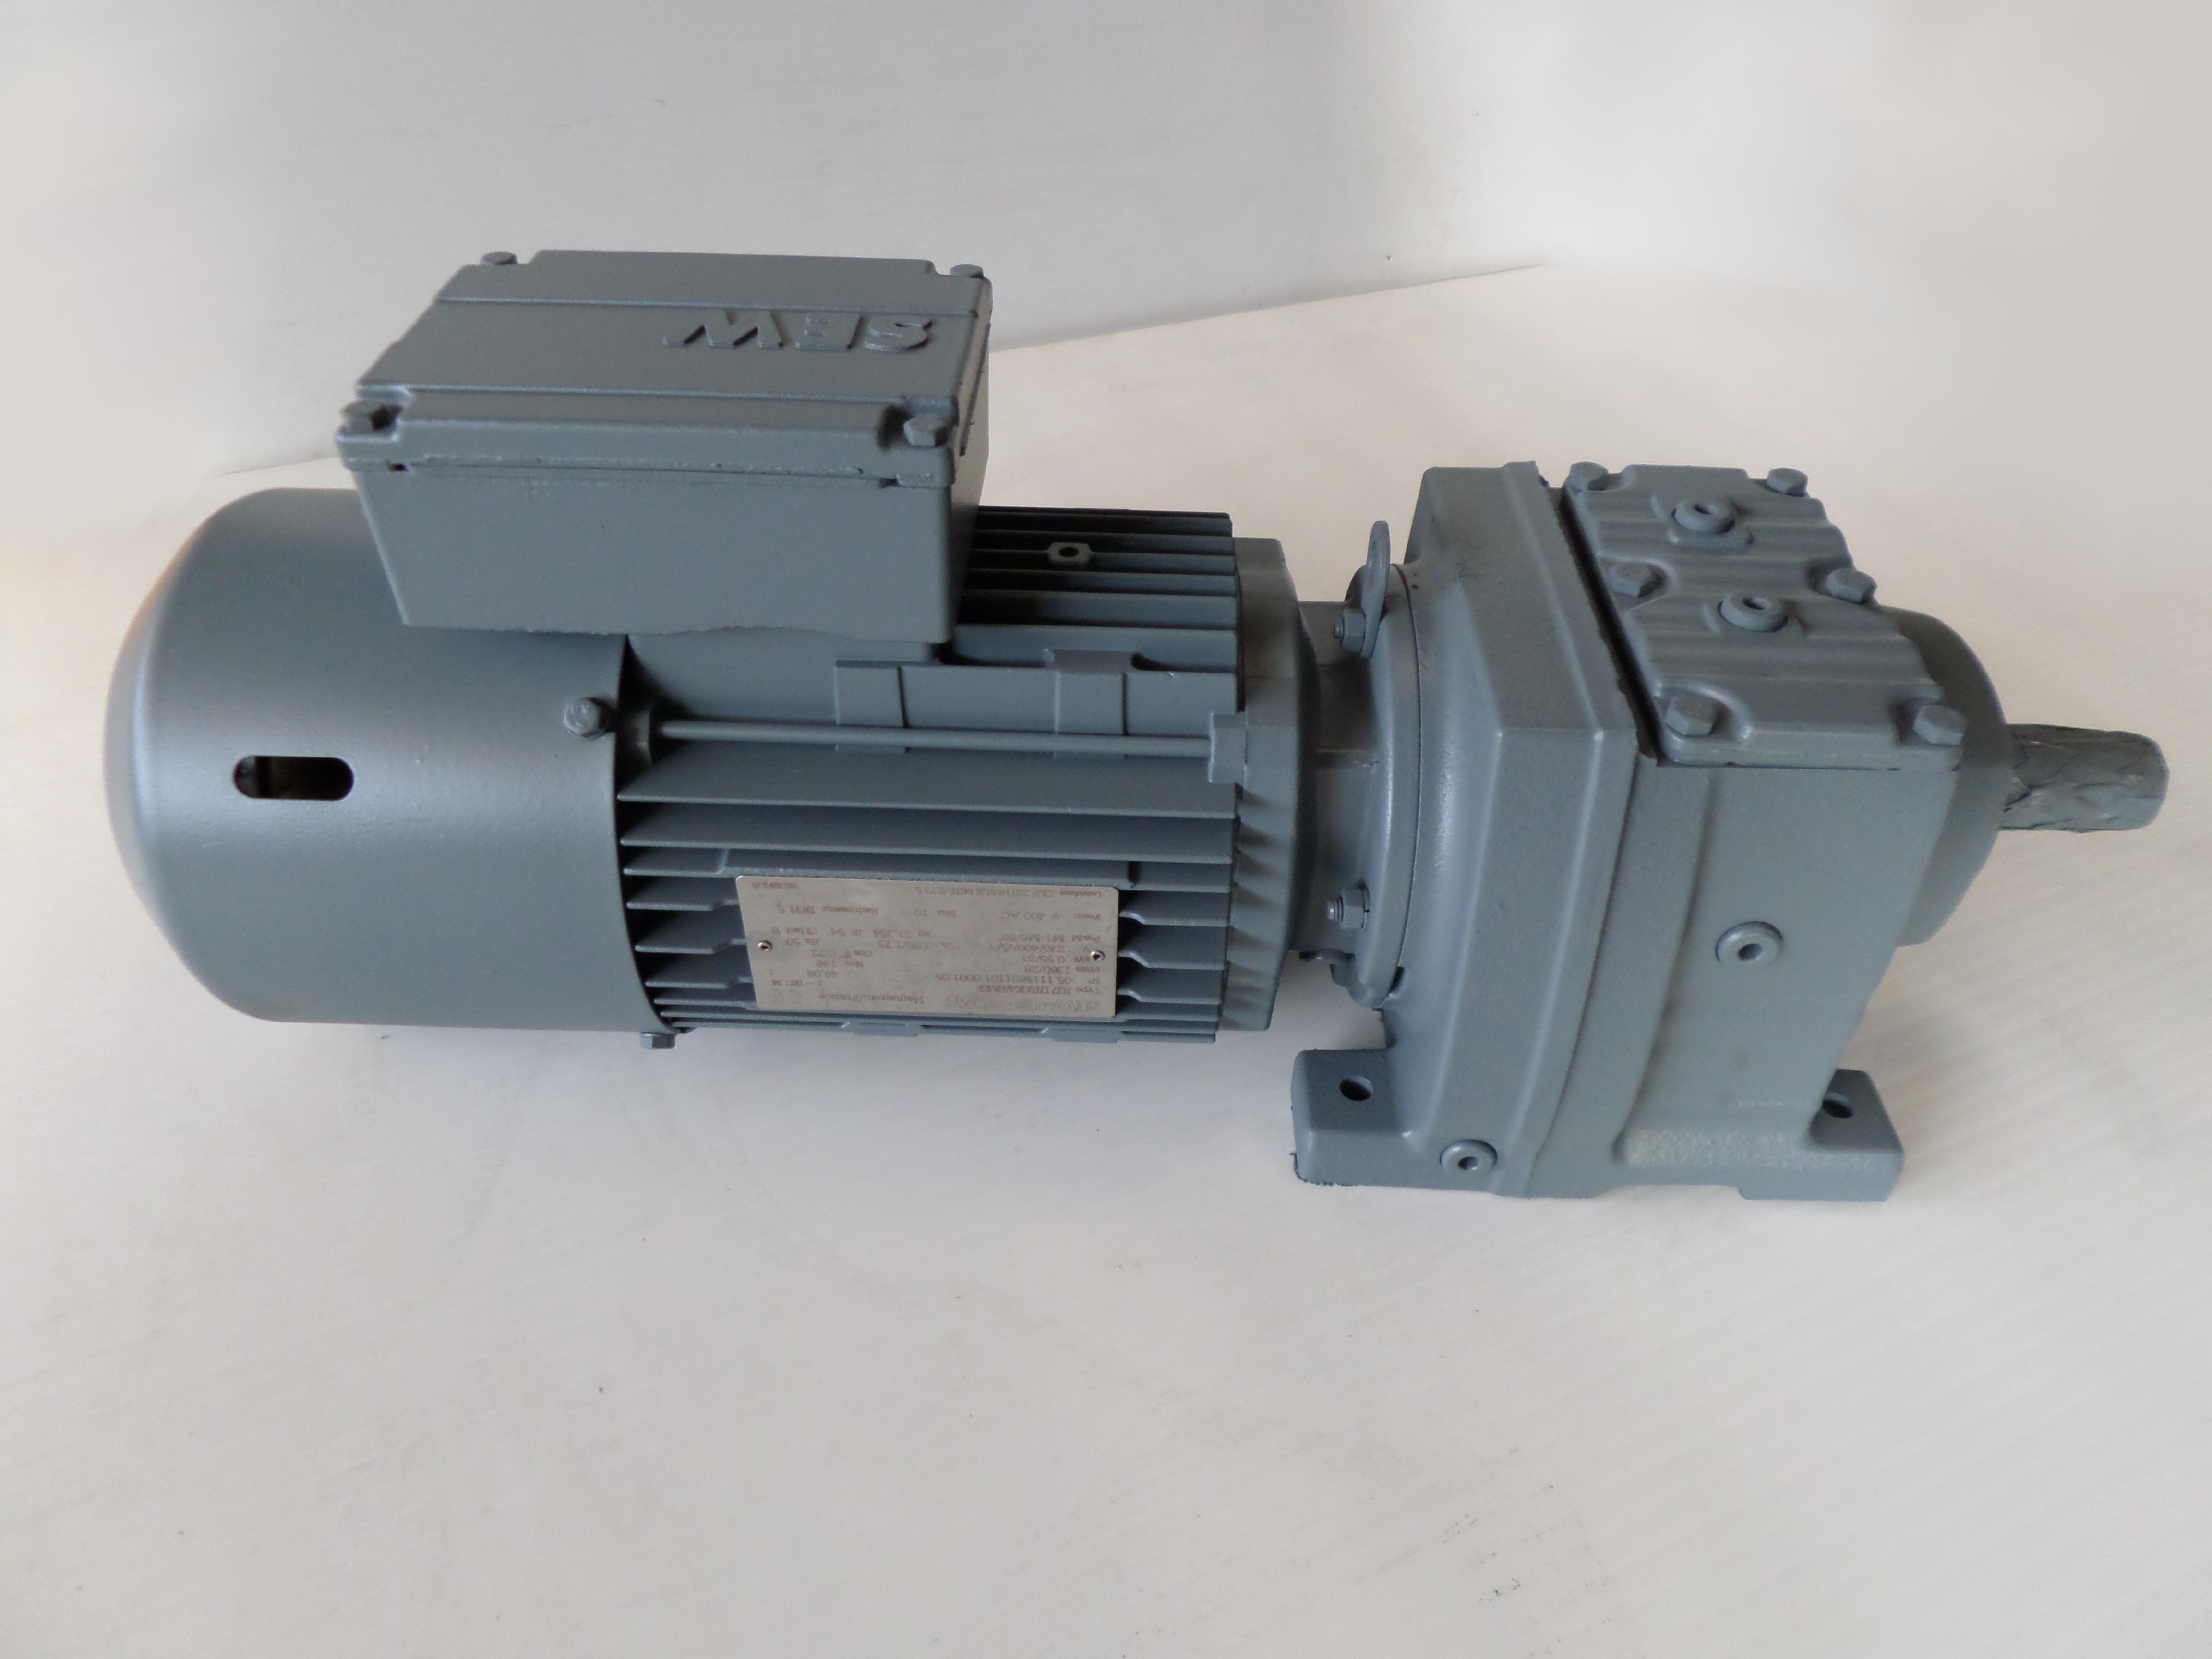 Motor Ducteur Sew Pdf Suivre For Speed